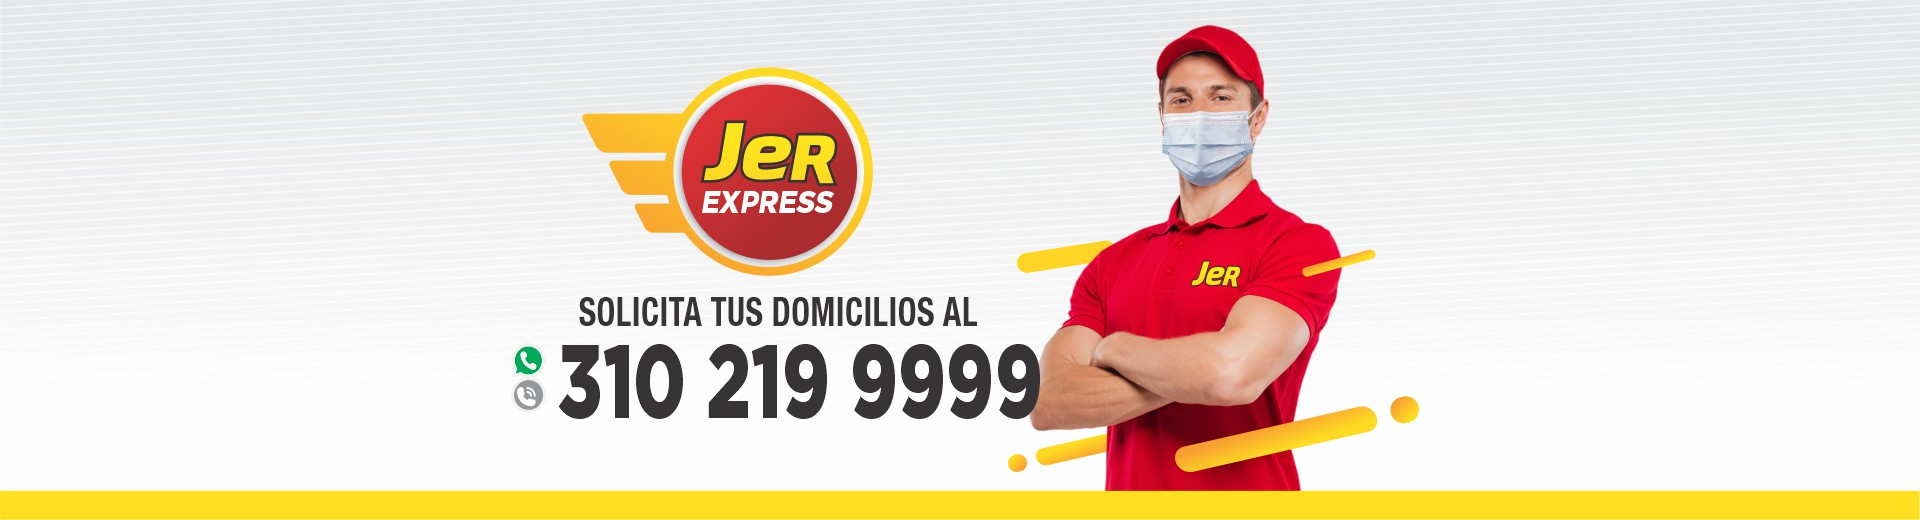 JEREXPRESS